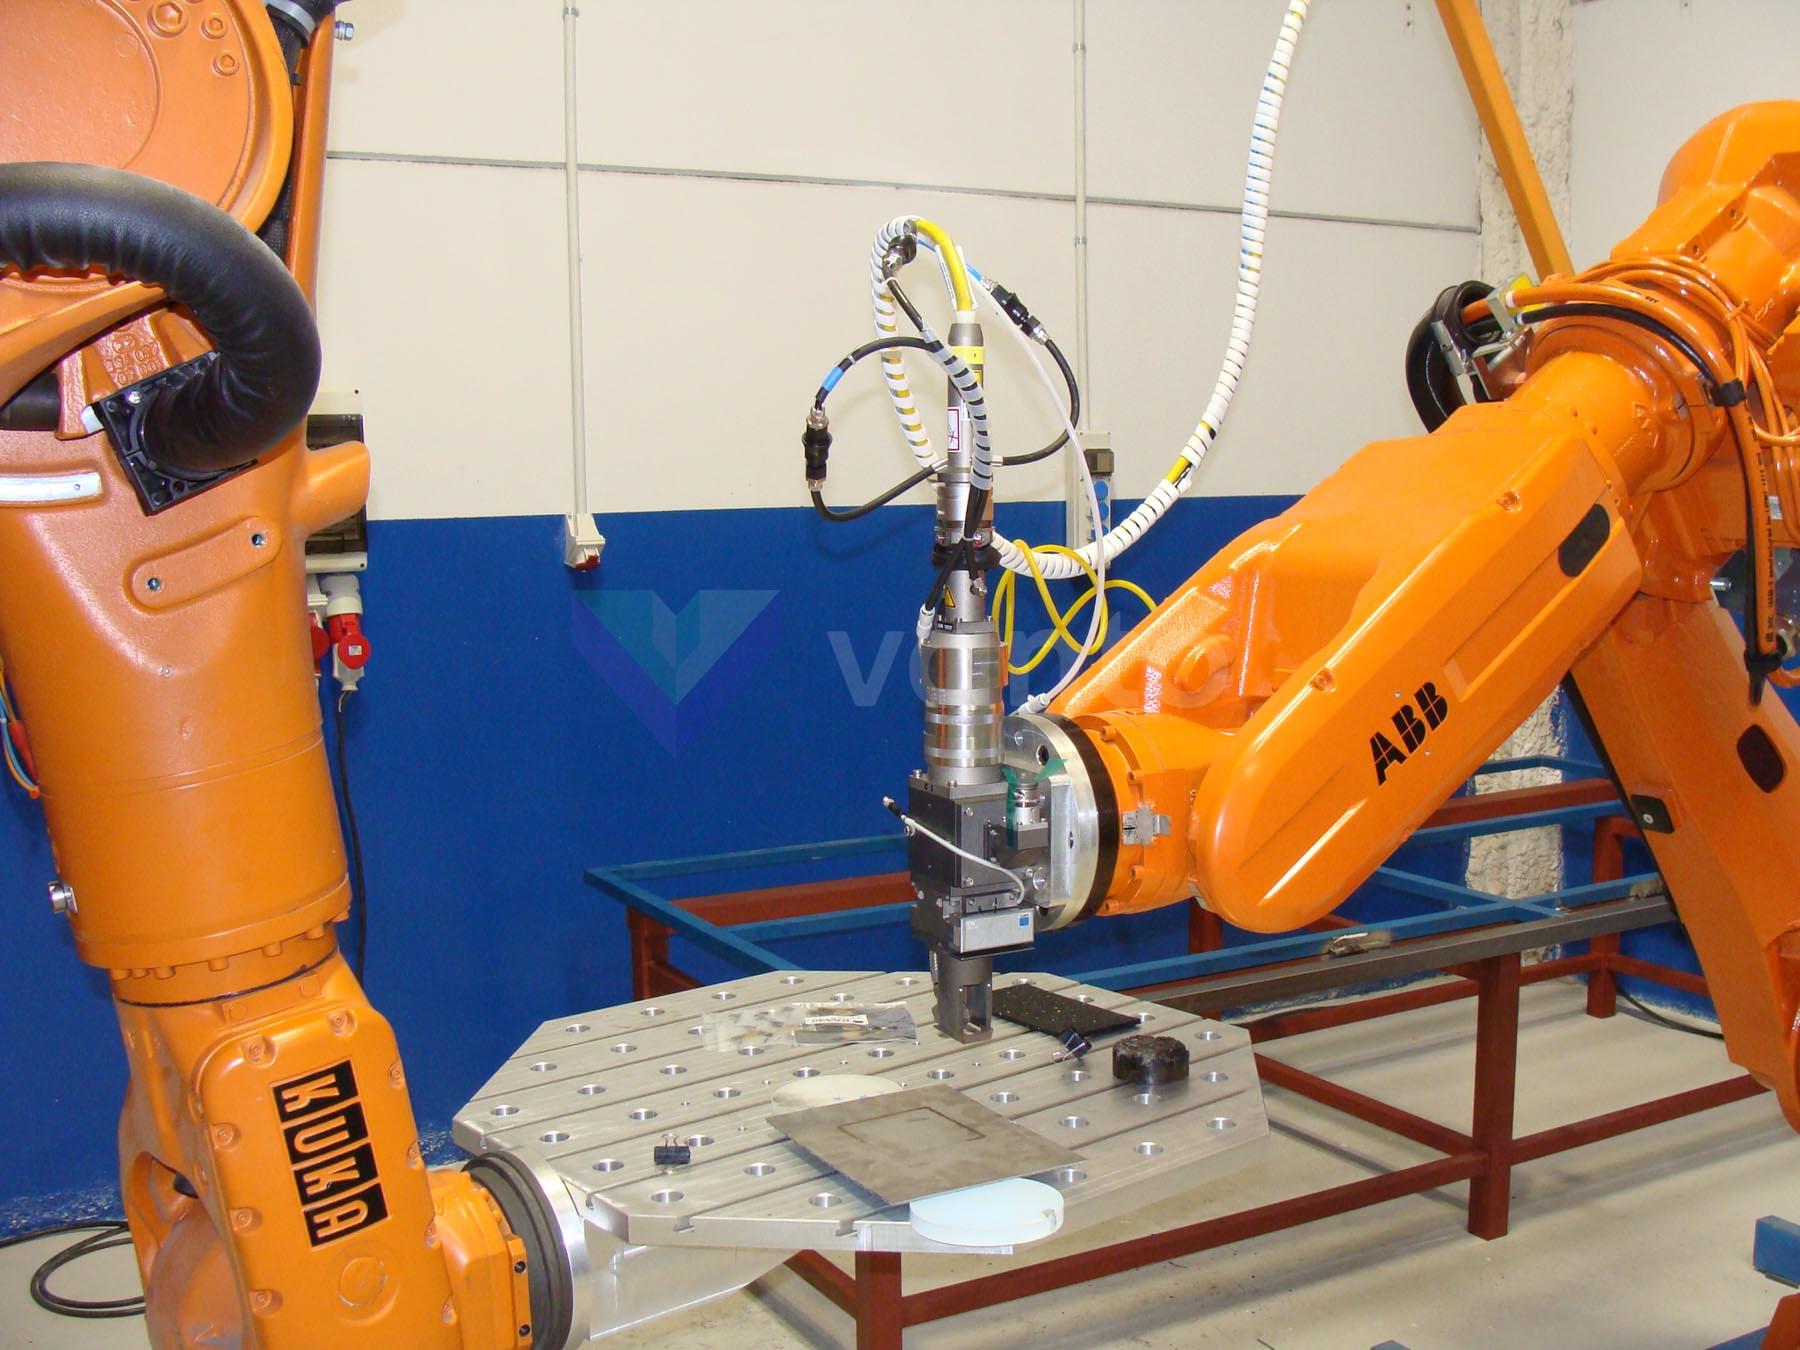 ABB IRB 6620 Robotic welding cell (2009) id10452